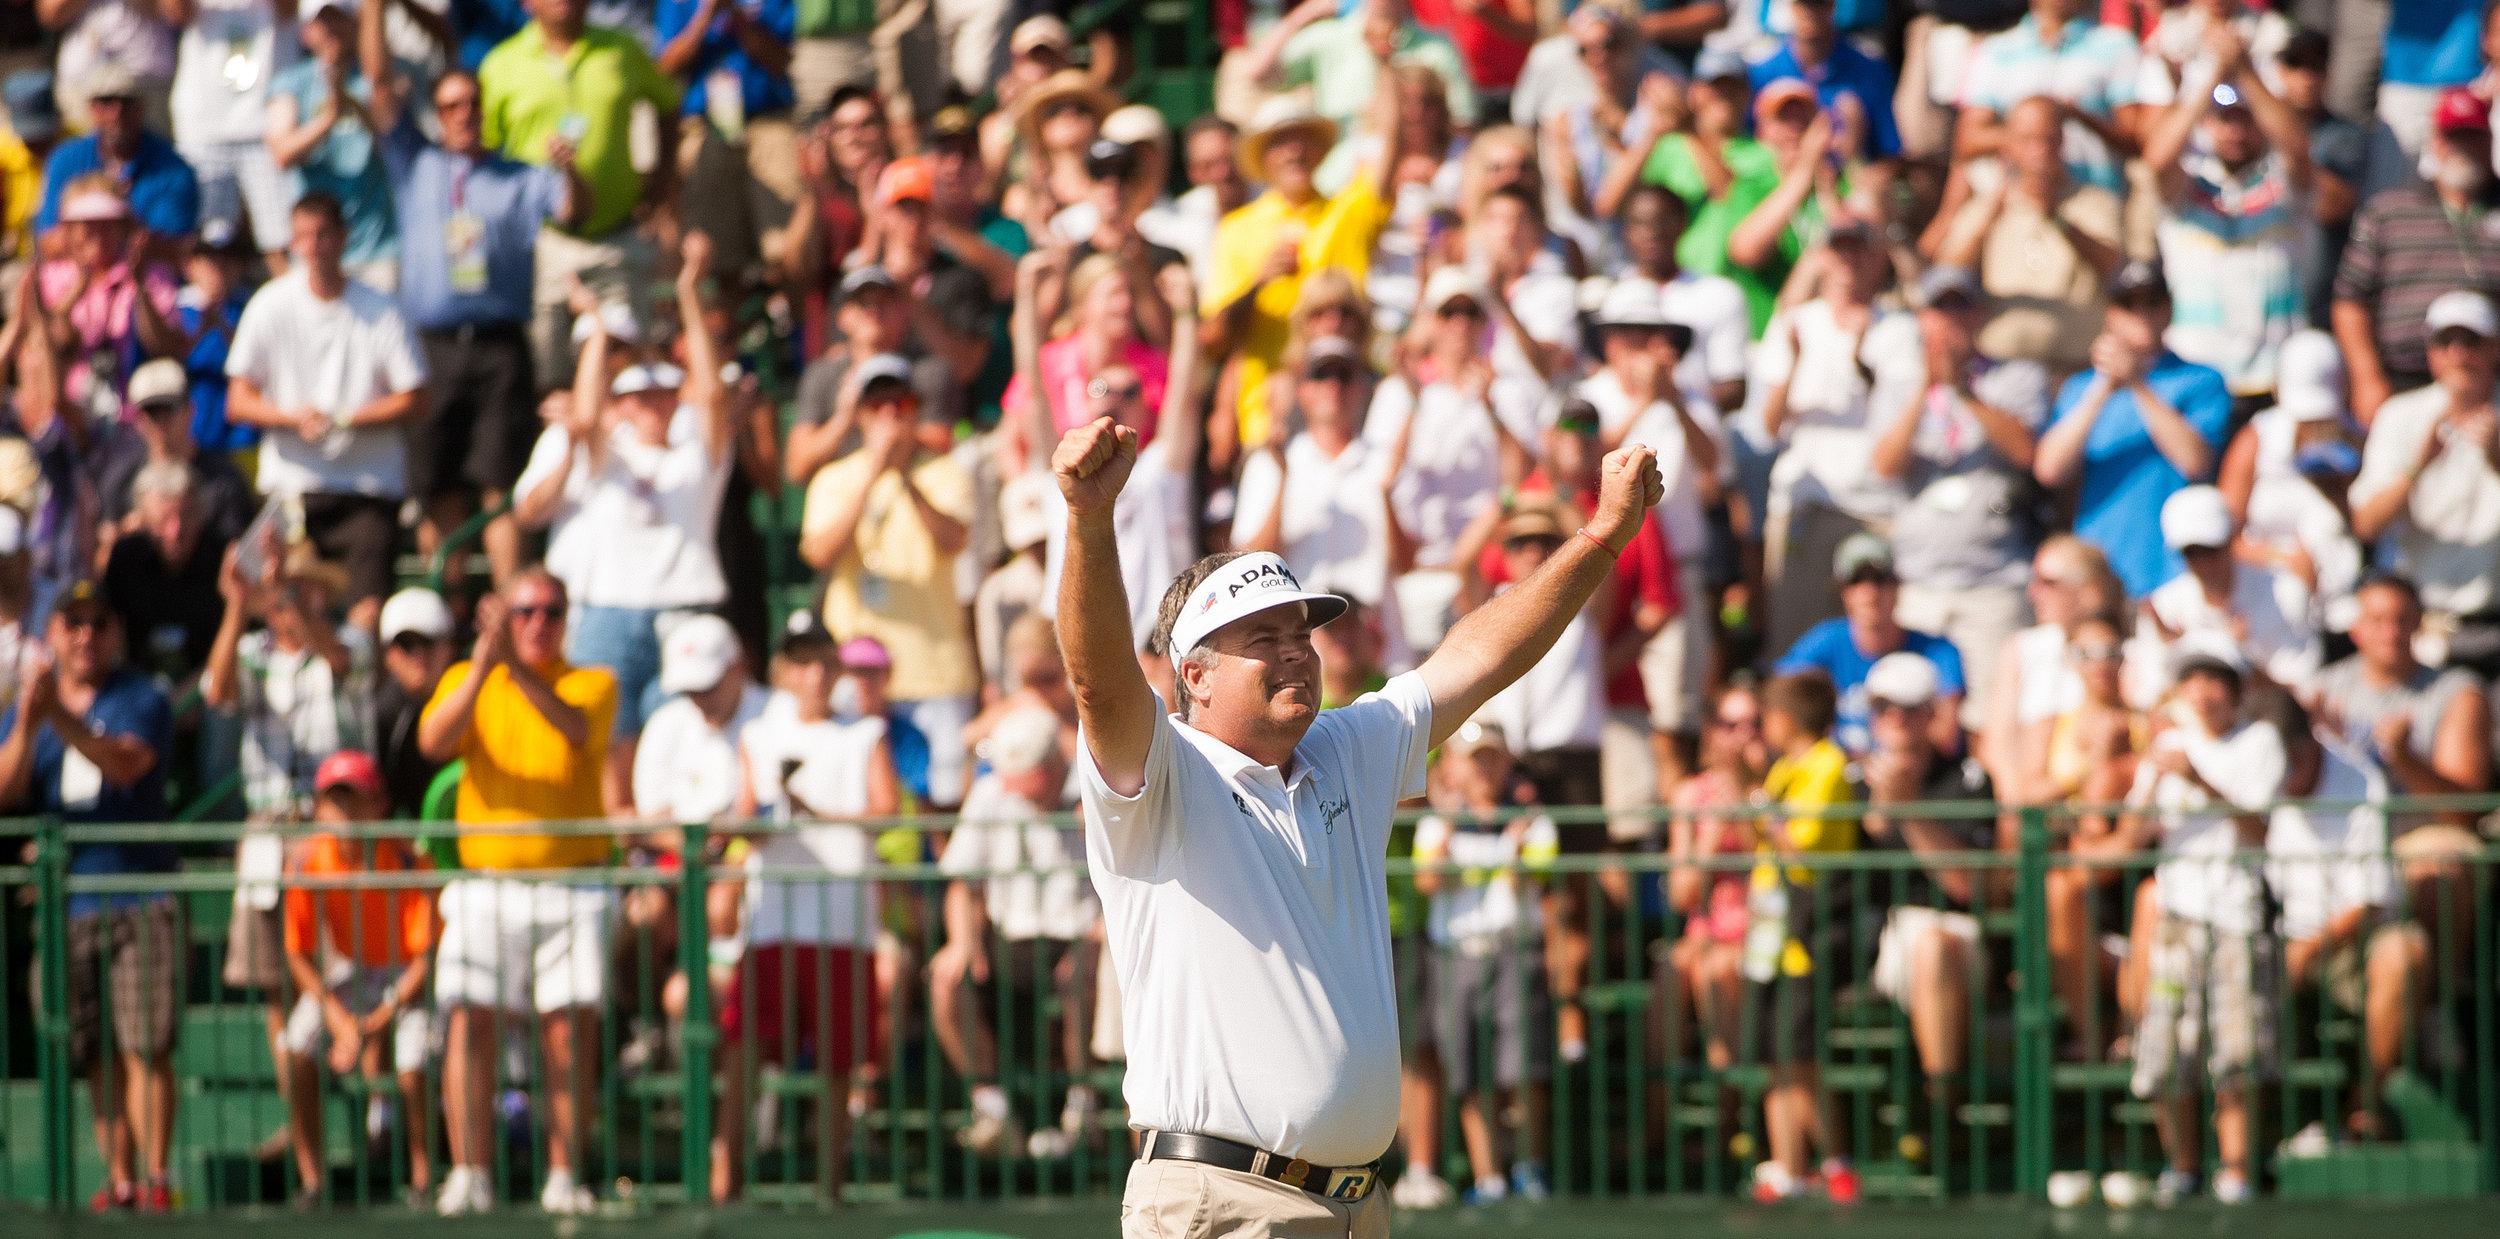 2021 U.S. Senior Open — BRUNO EVENT TEAM - Official U.S ...